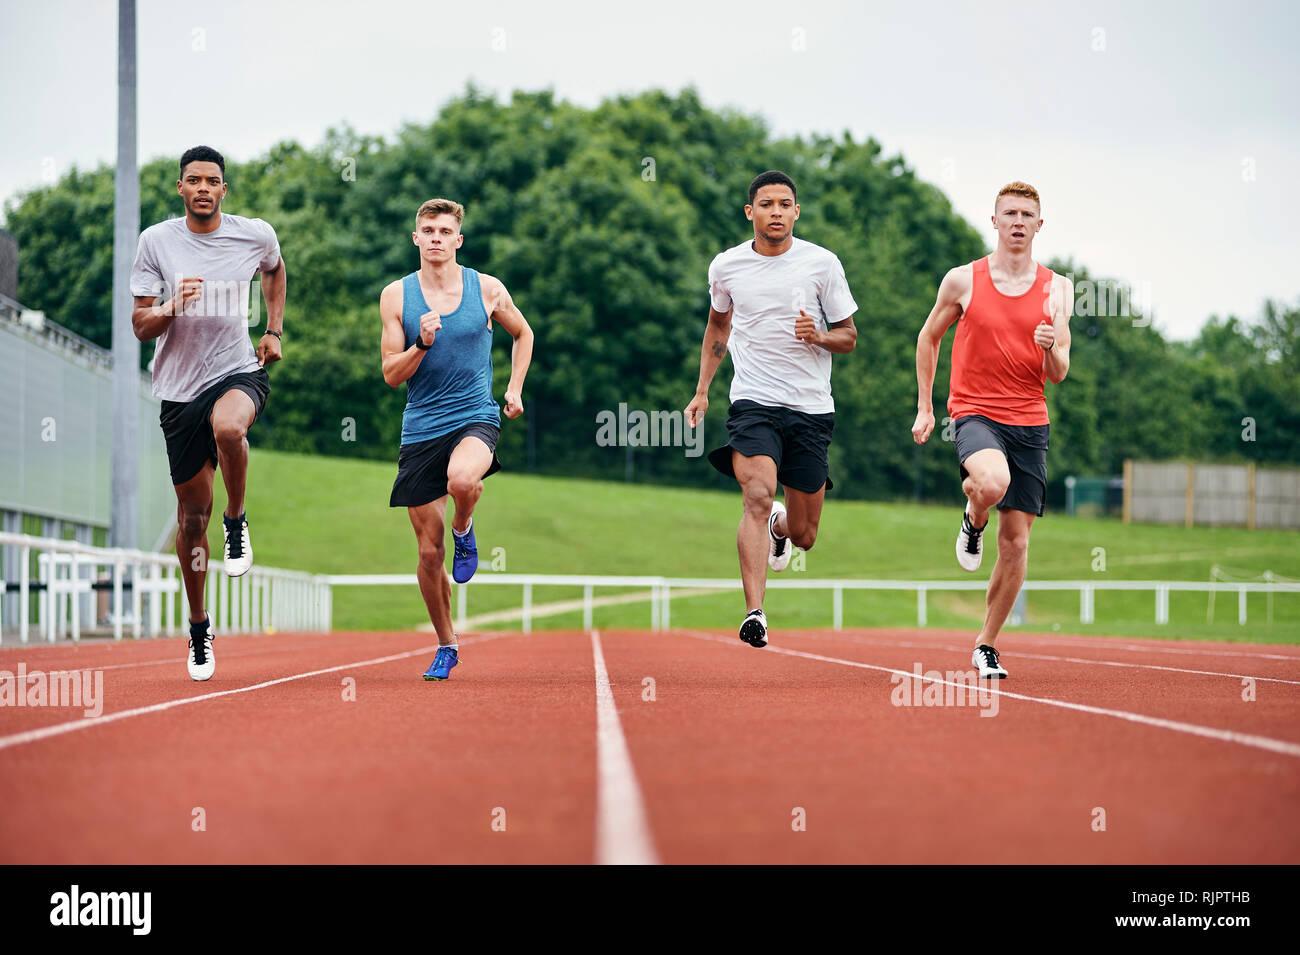 Runners training on running track - Stock Image